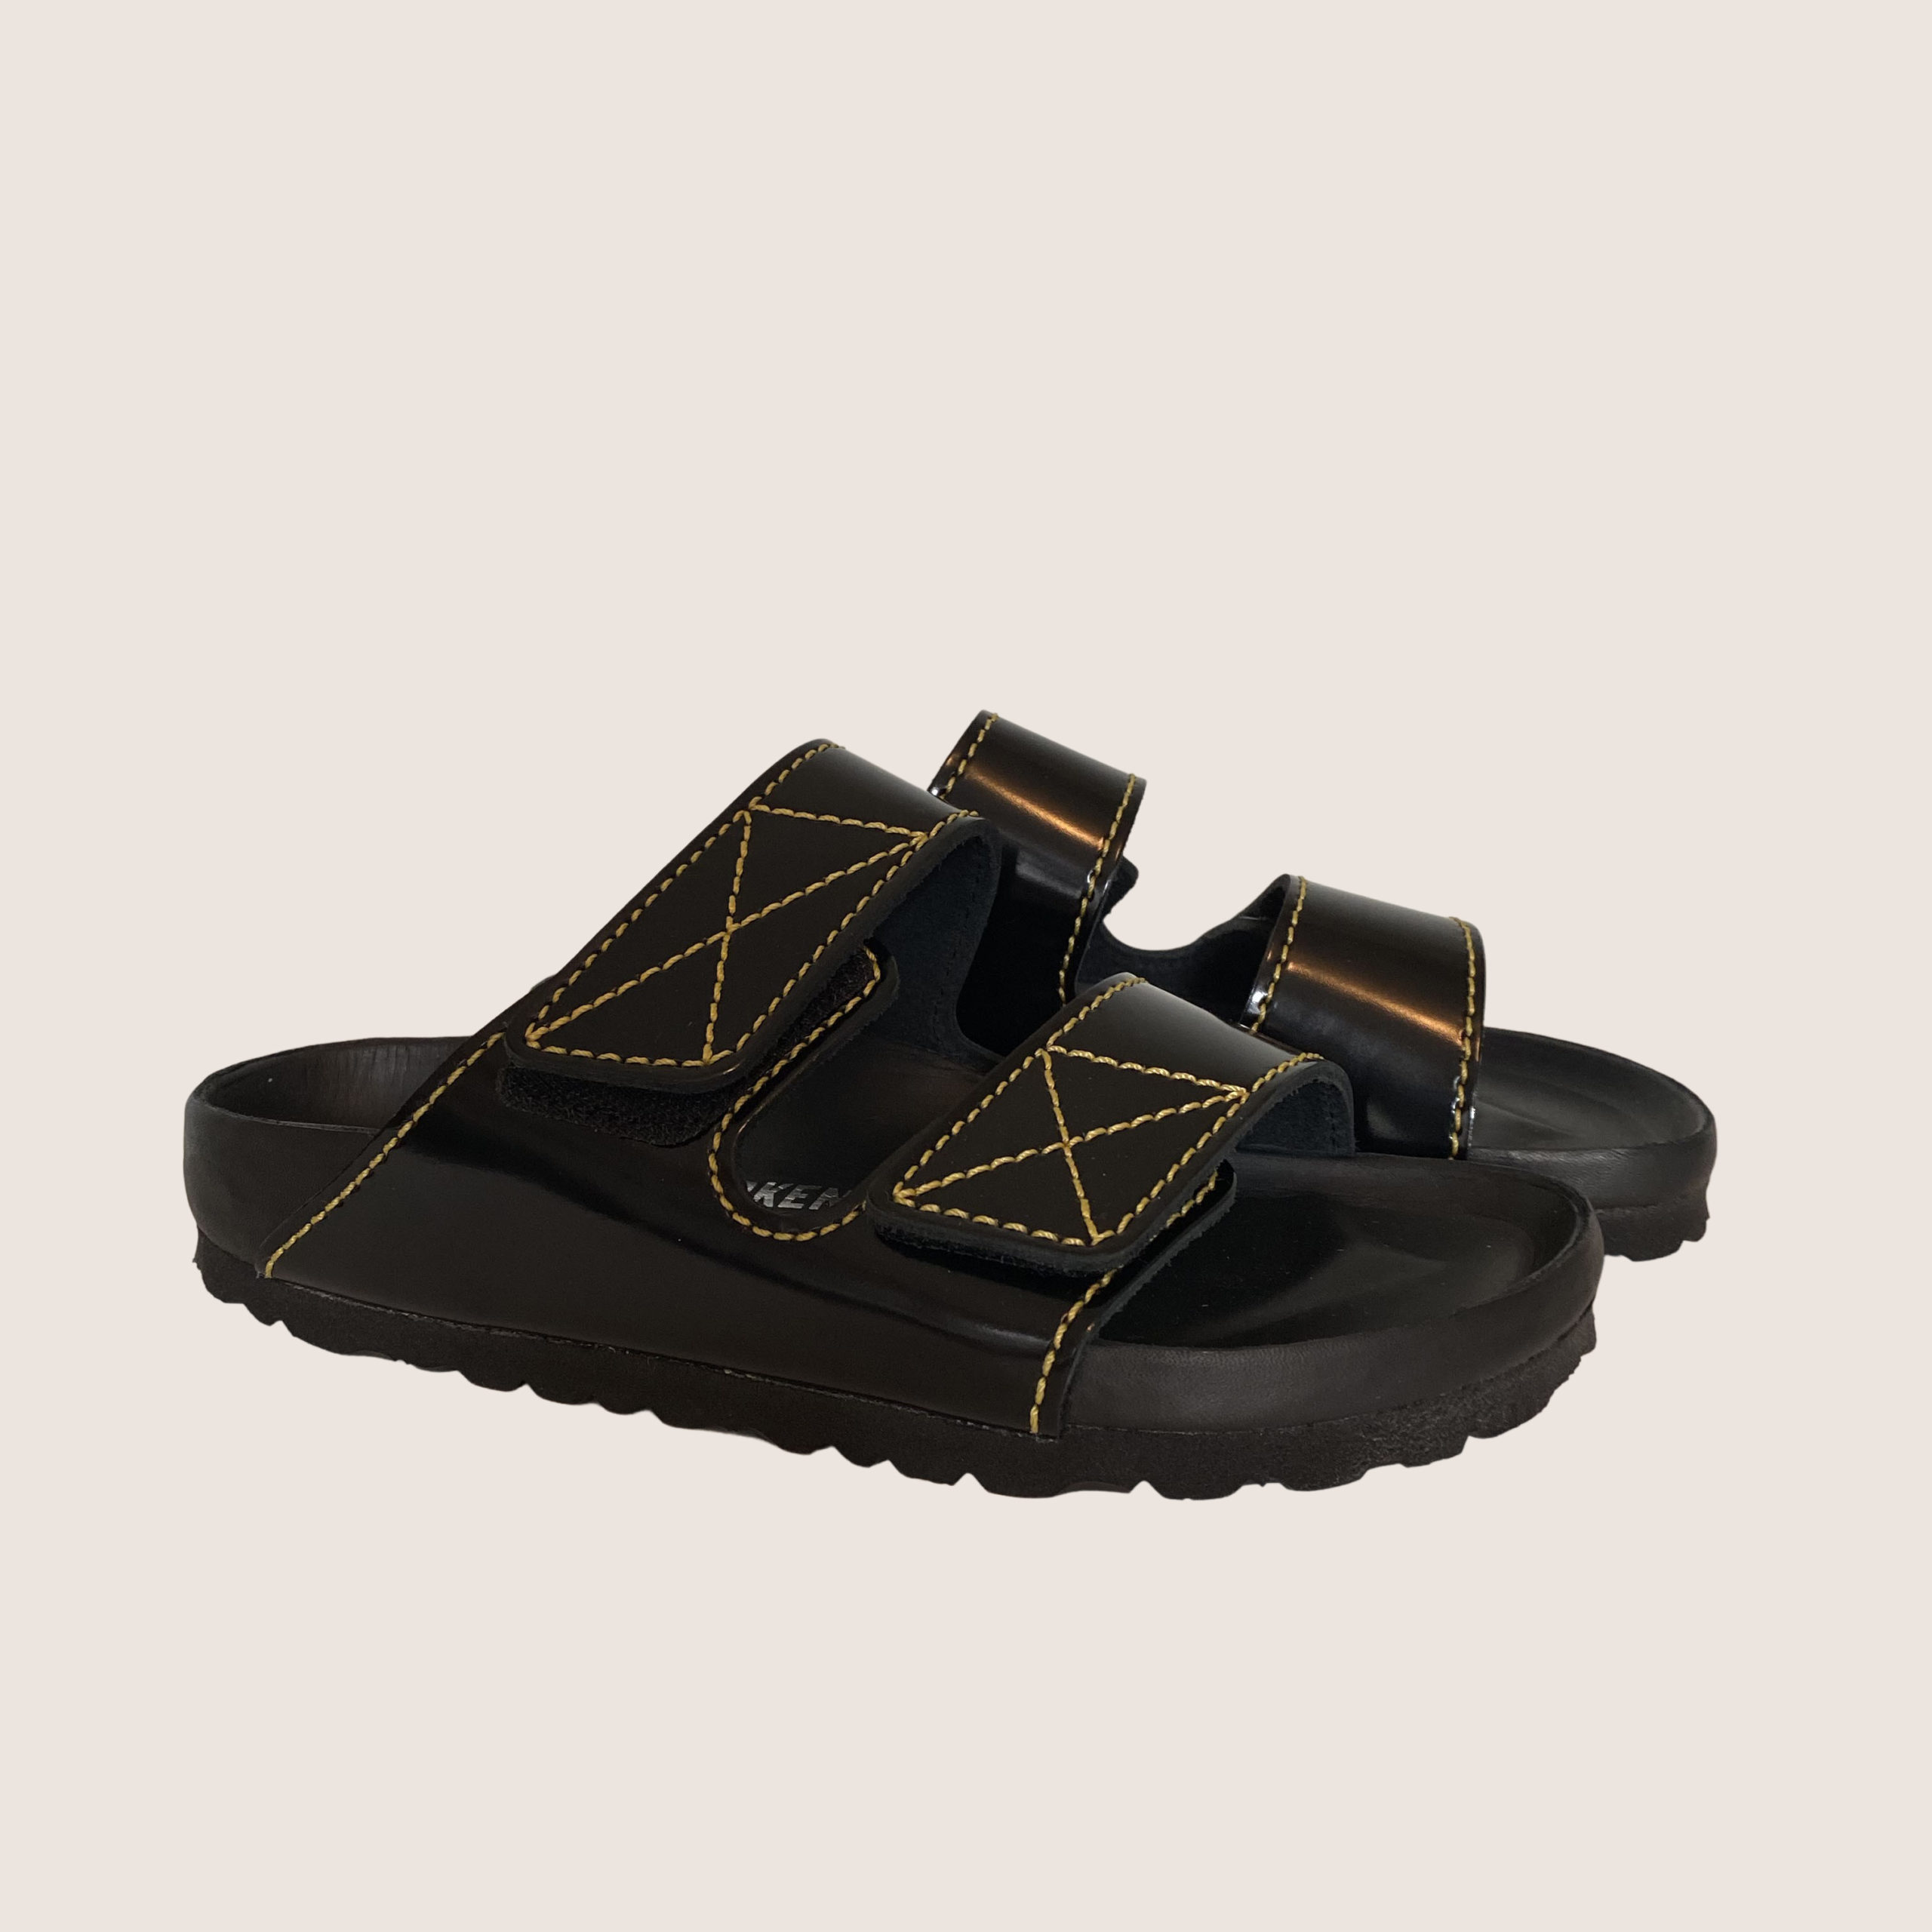 Birkenstock x PS Arizona Slides